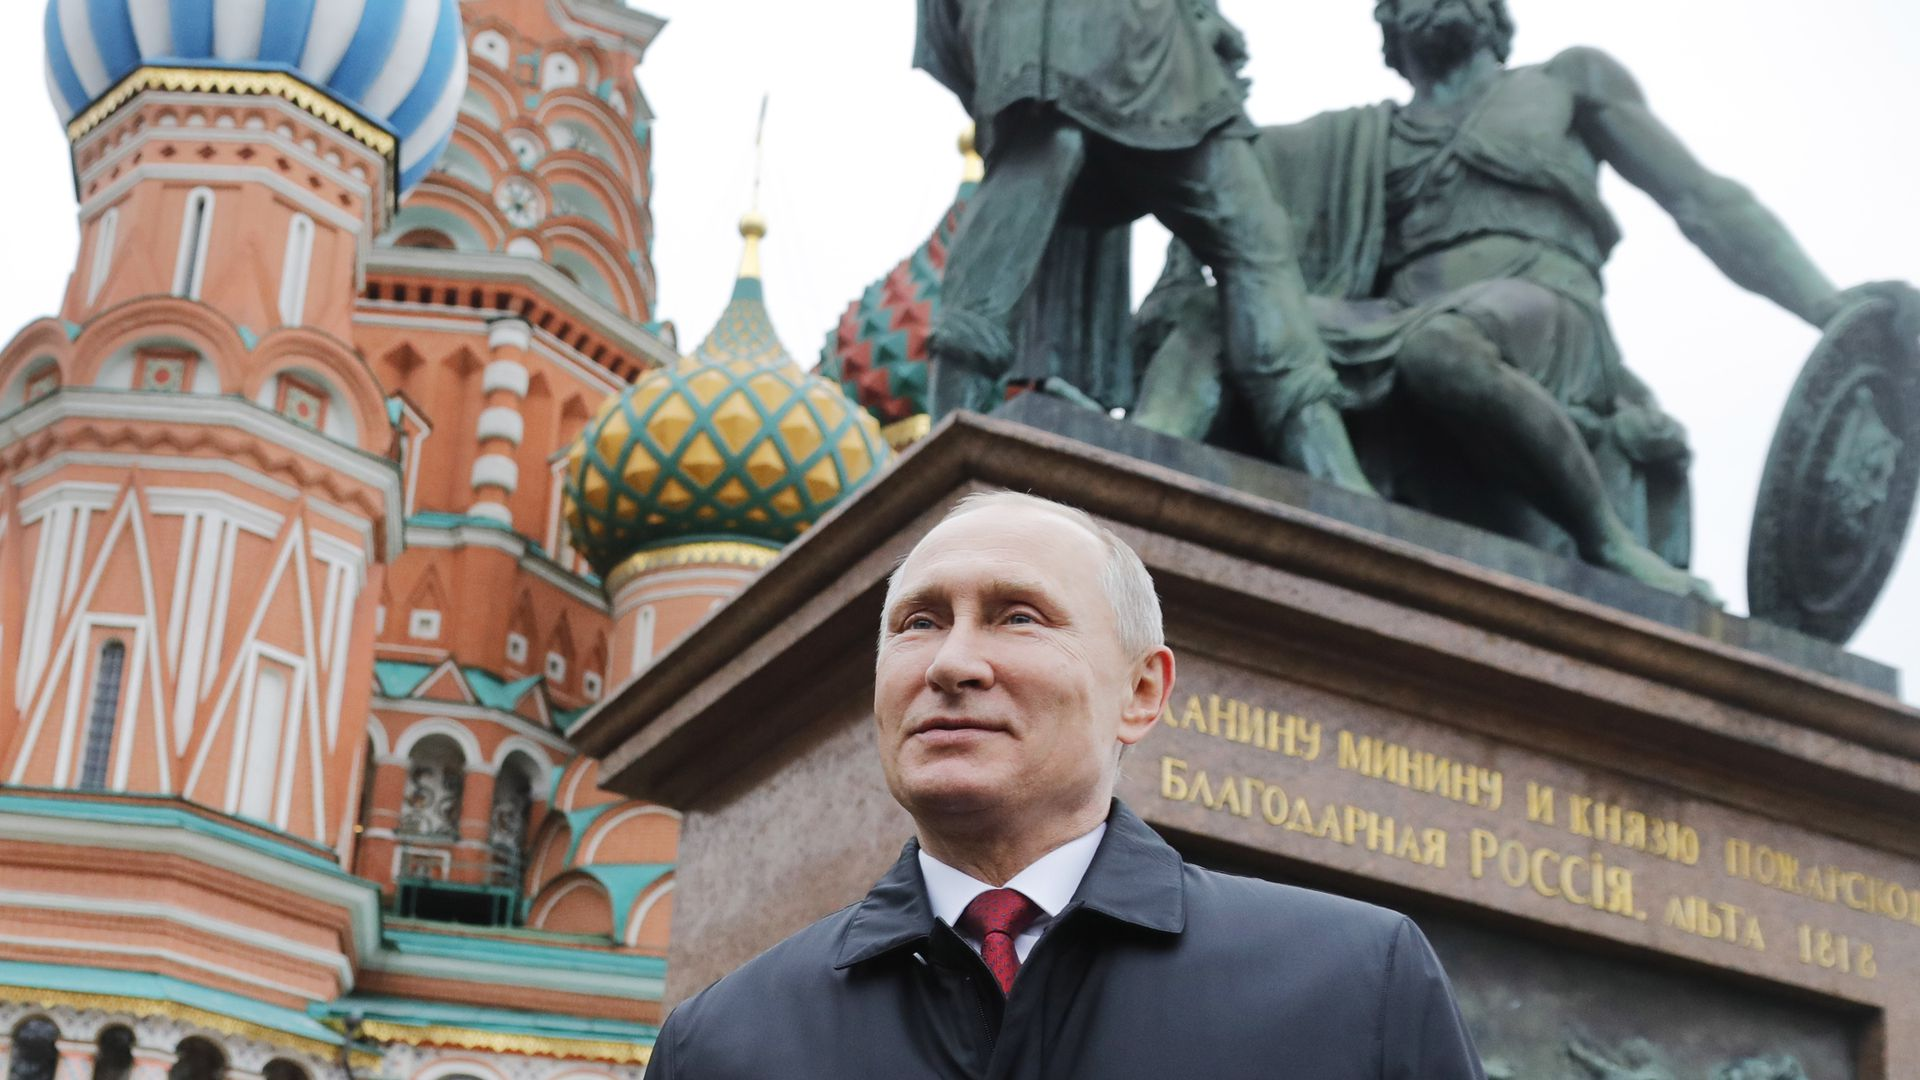 Vladimir Putin in front of Kremlin